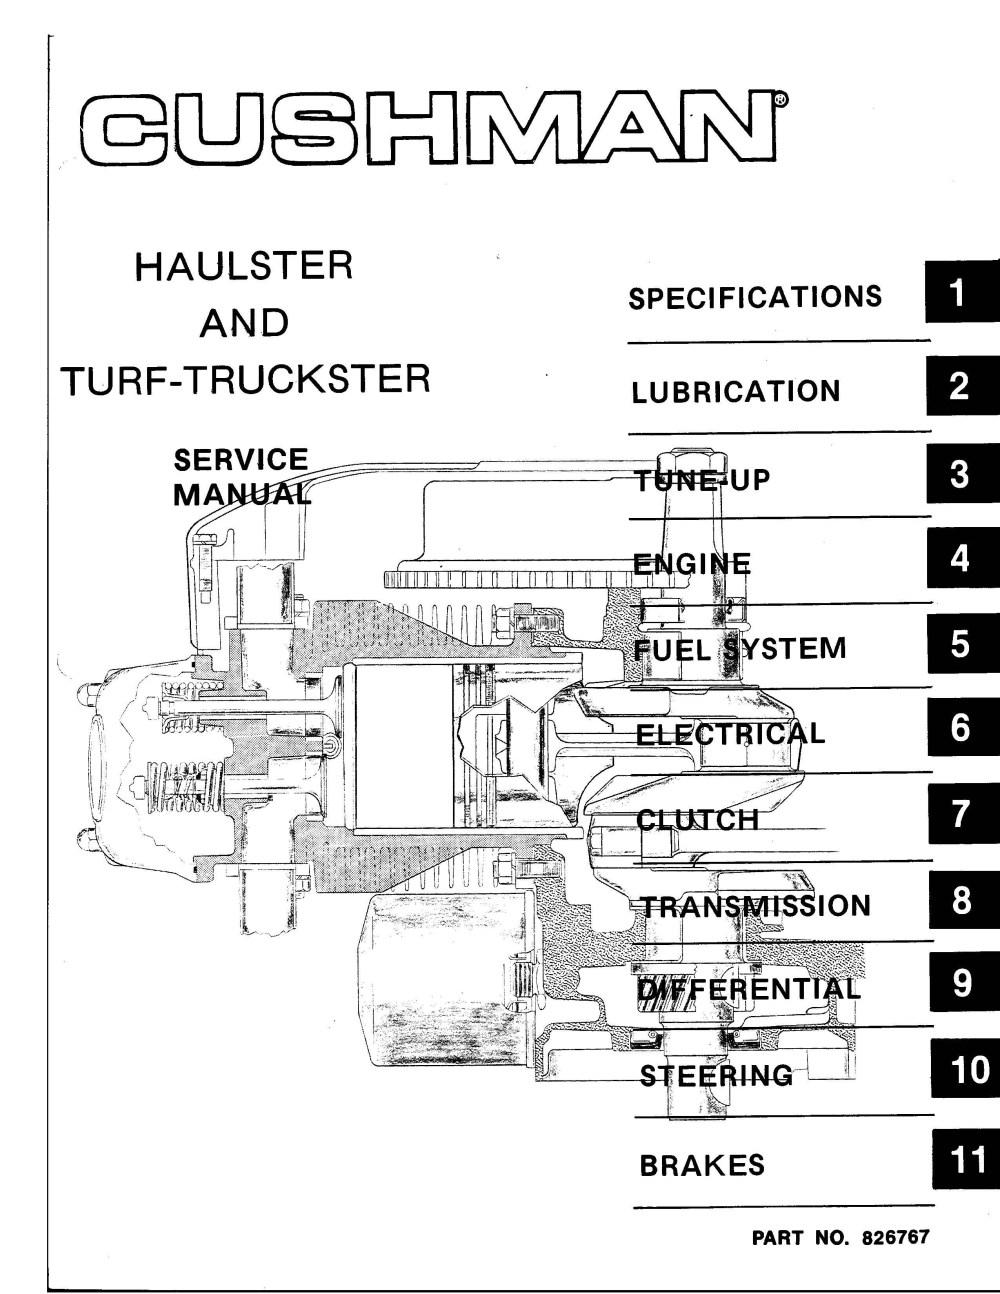 medium resolution of club car parts diagram september 2017 archives 23 club car carburetor diagram of club car parts